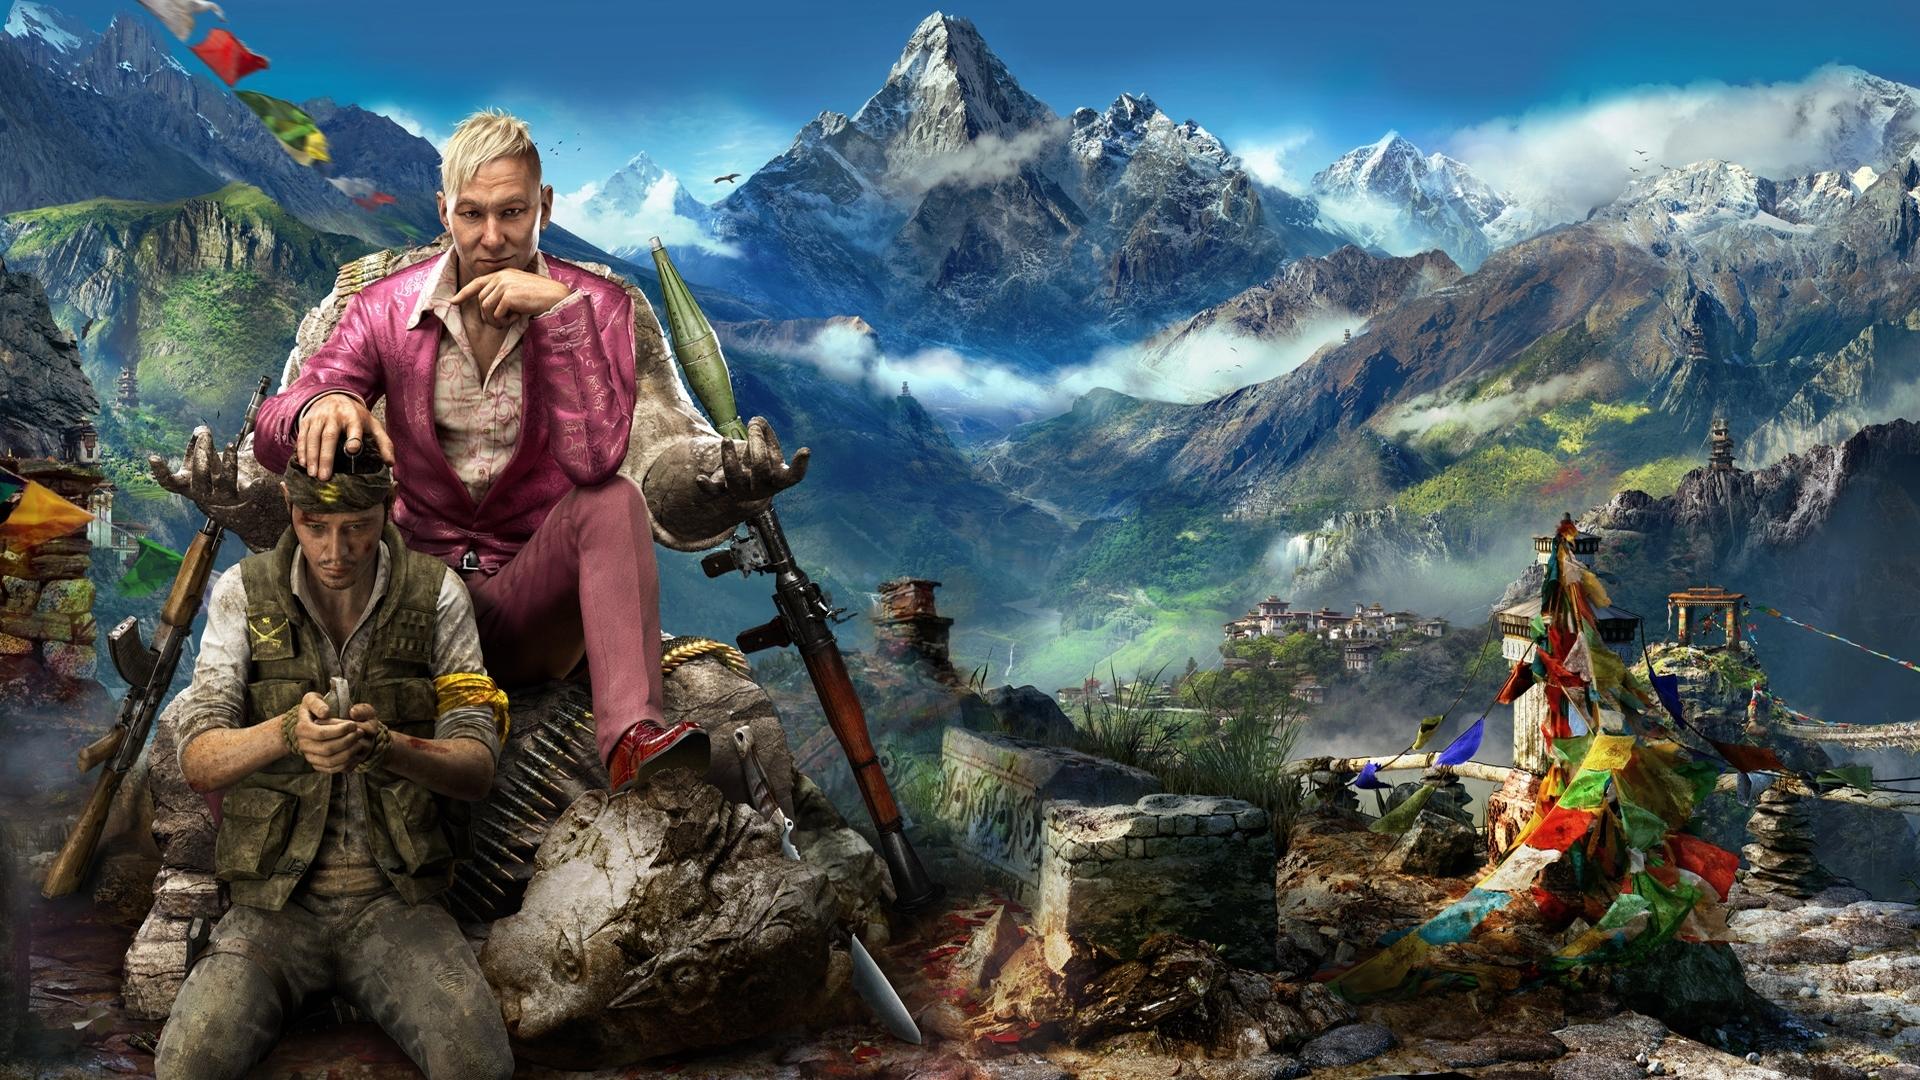 Fondos De Pantalla Ubisoft Far Cry 4 Pagan Min Captura